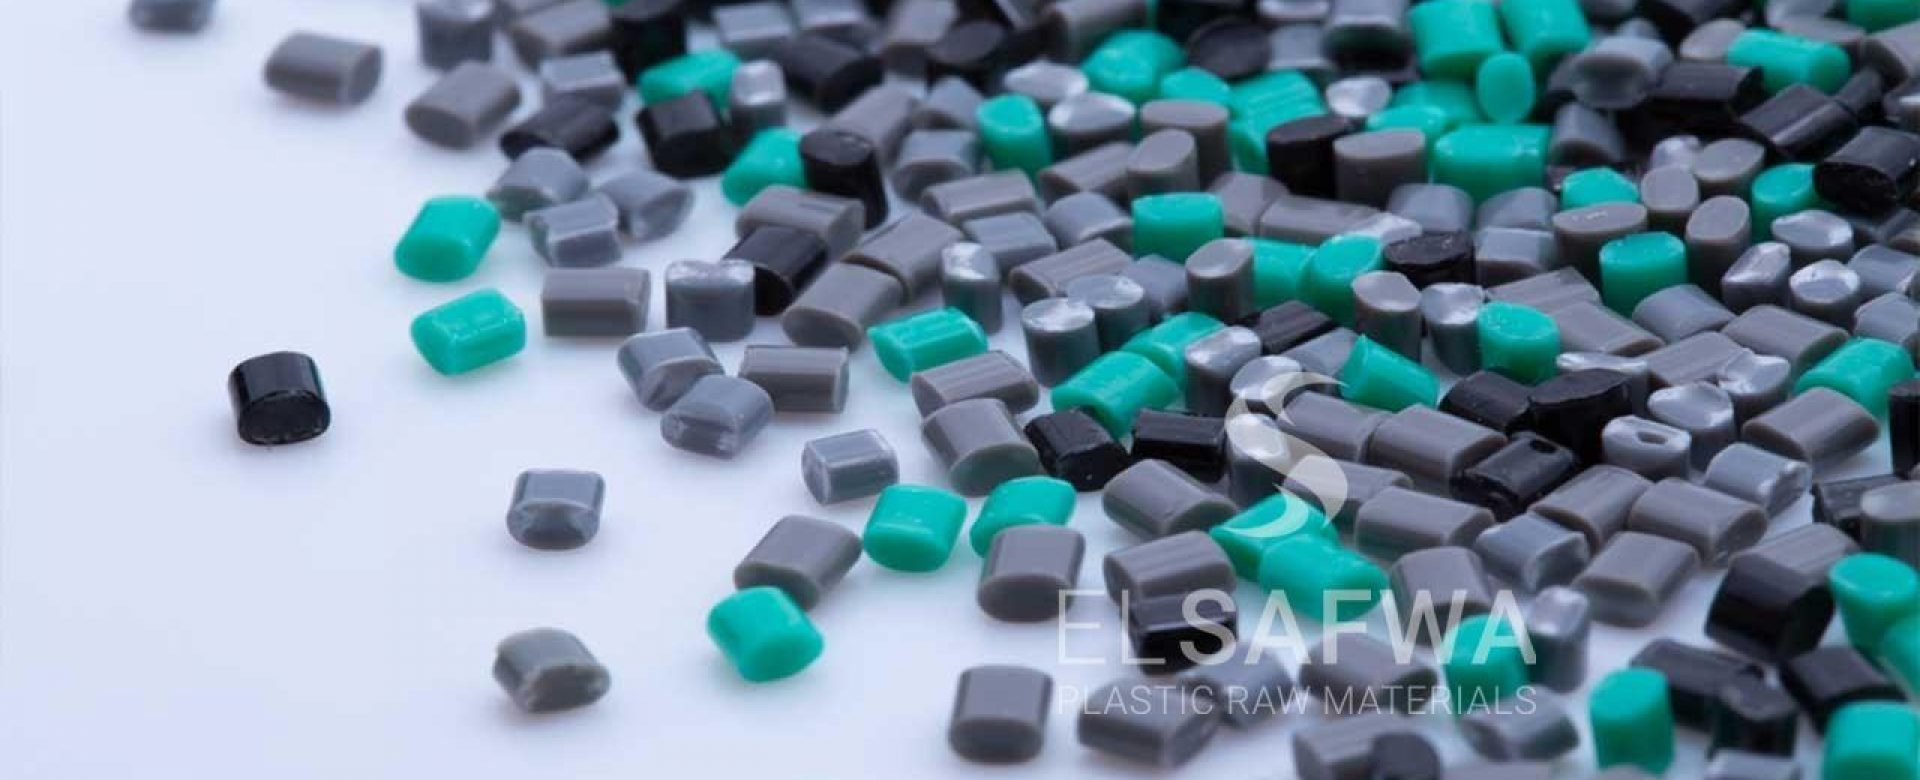 El-safwa-trade-plastic-trading-raw-materials-recycled-pvc